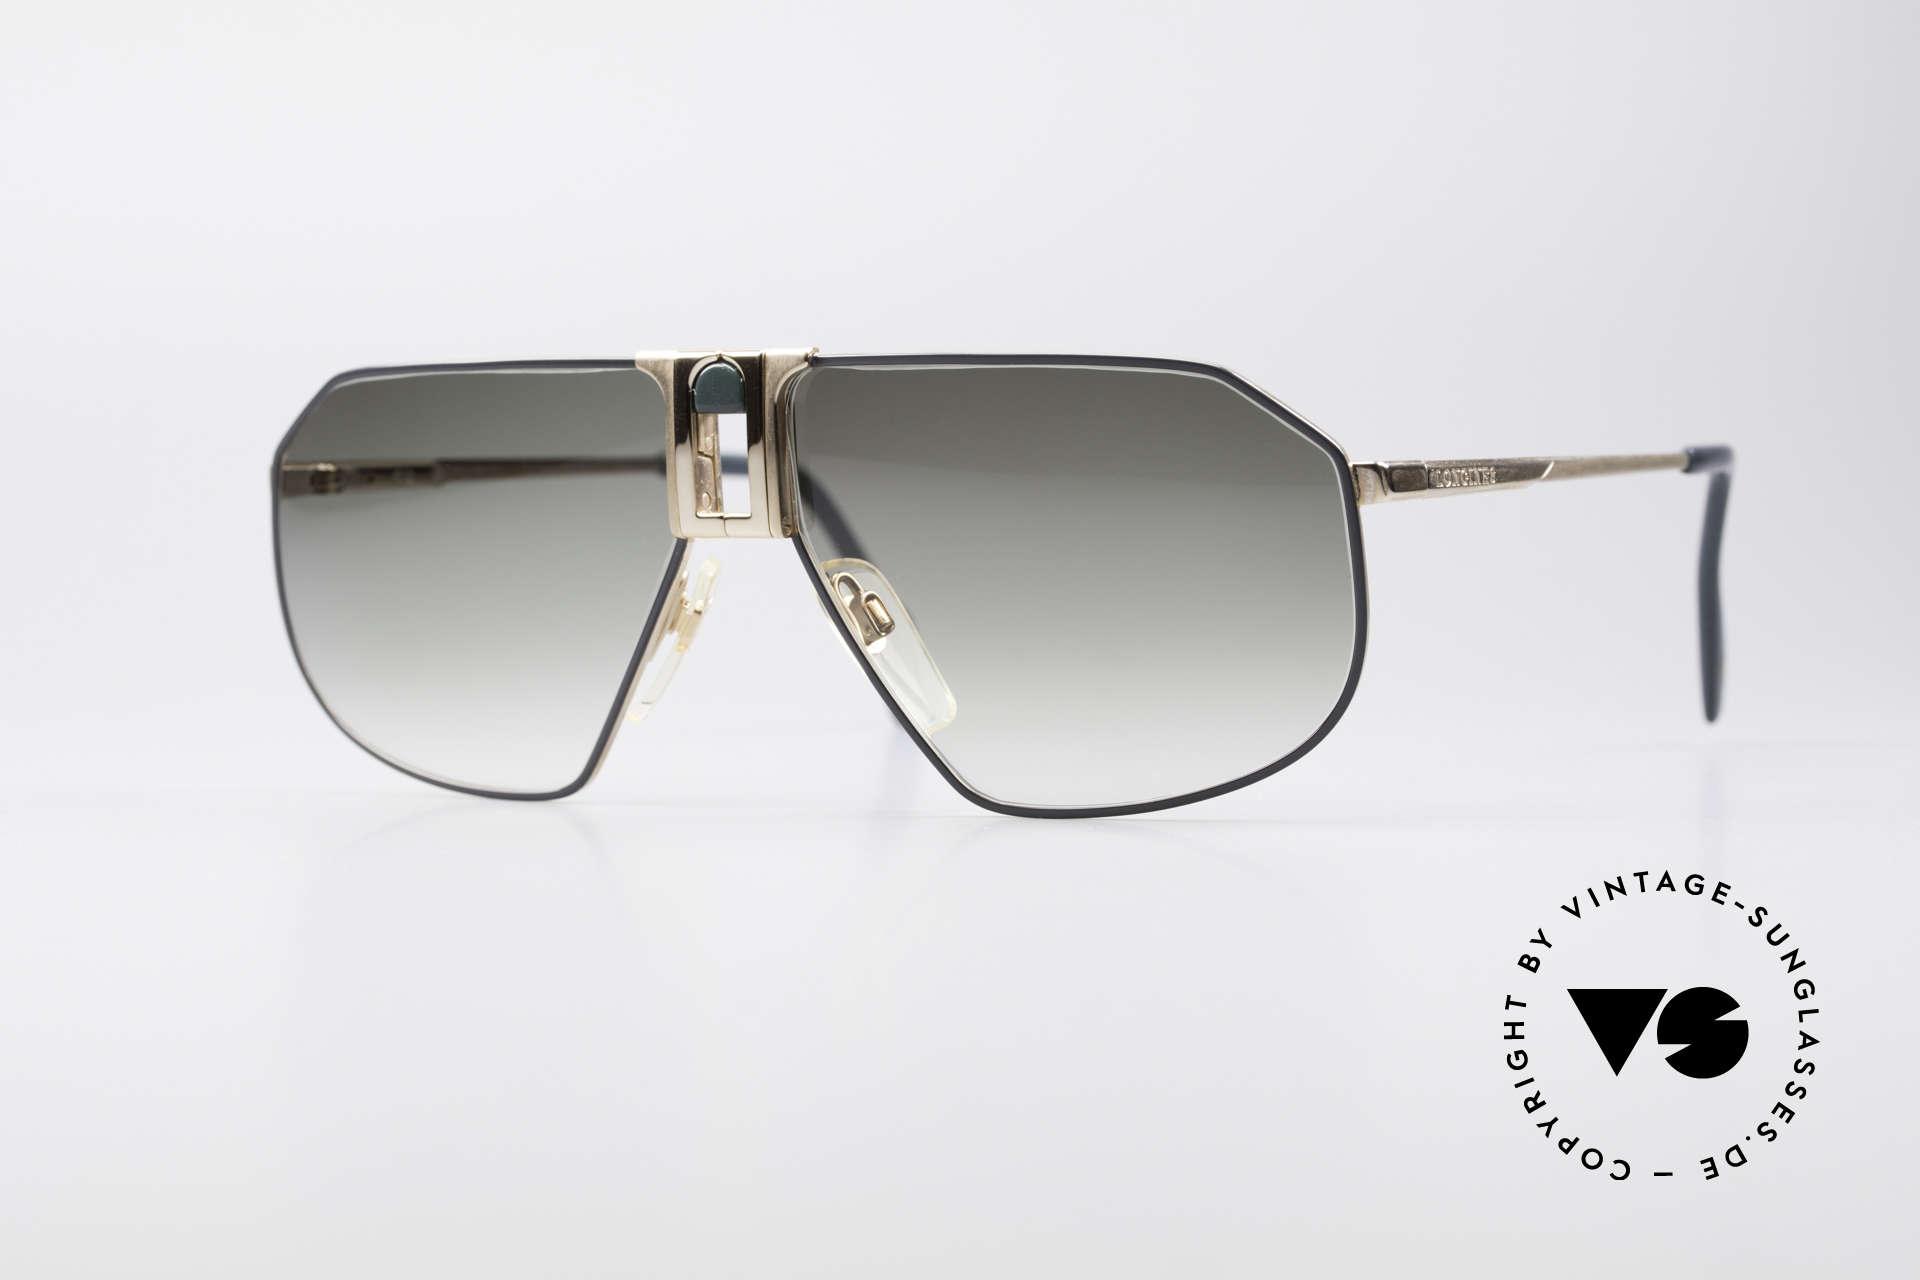 Longines 0153 No Retro Vintage Herrenbrille, hochwertige vintage Sonnenbrille von LONGINES, Passend für Herren